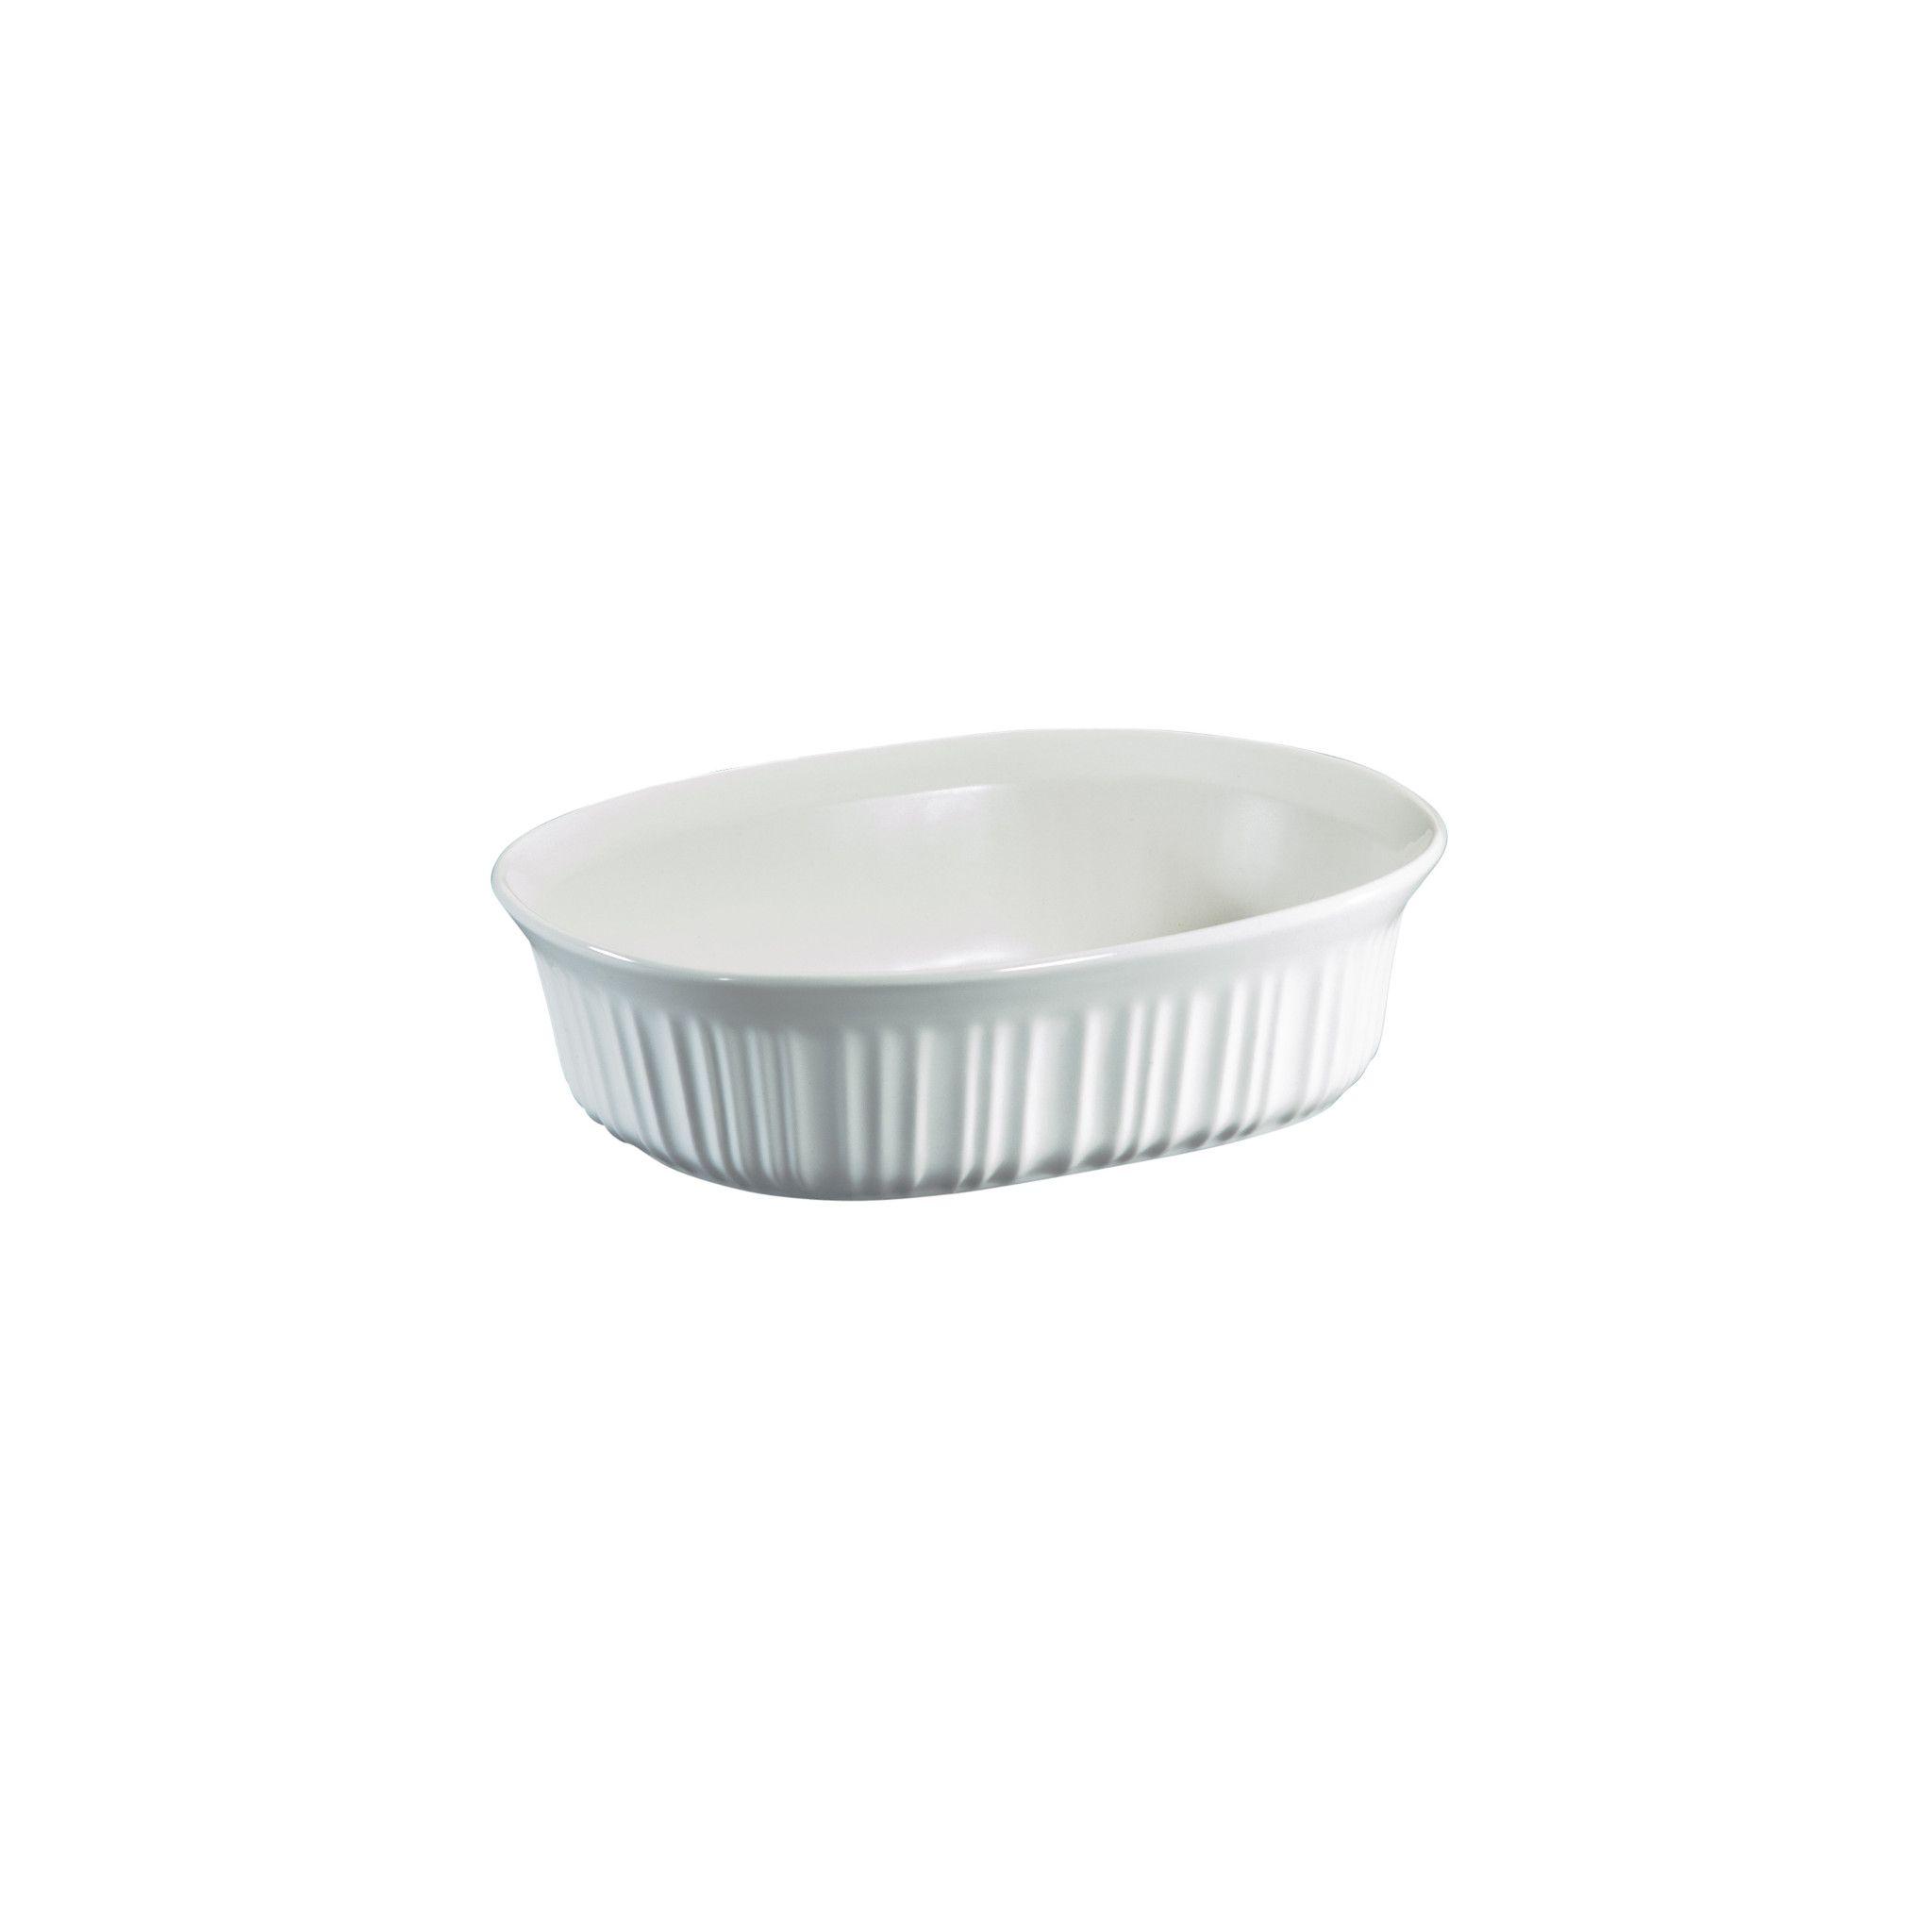 Corningware French White 1.5-Qt Oval Casserole